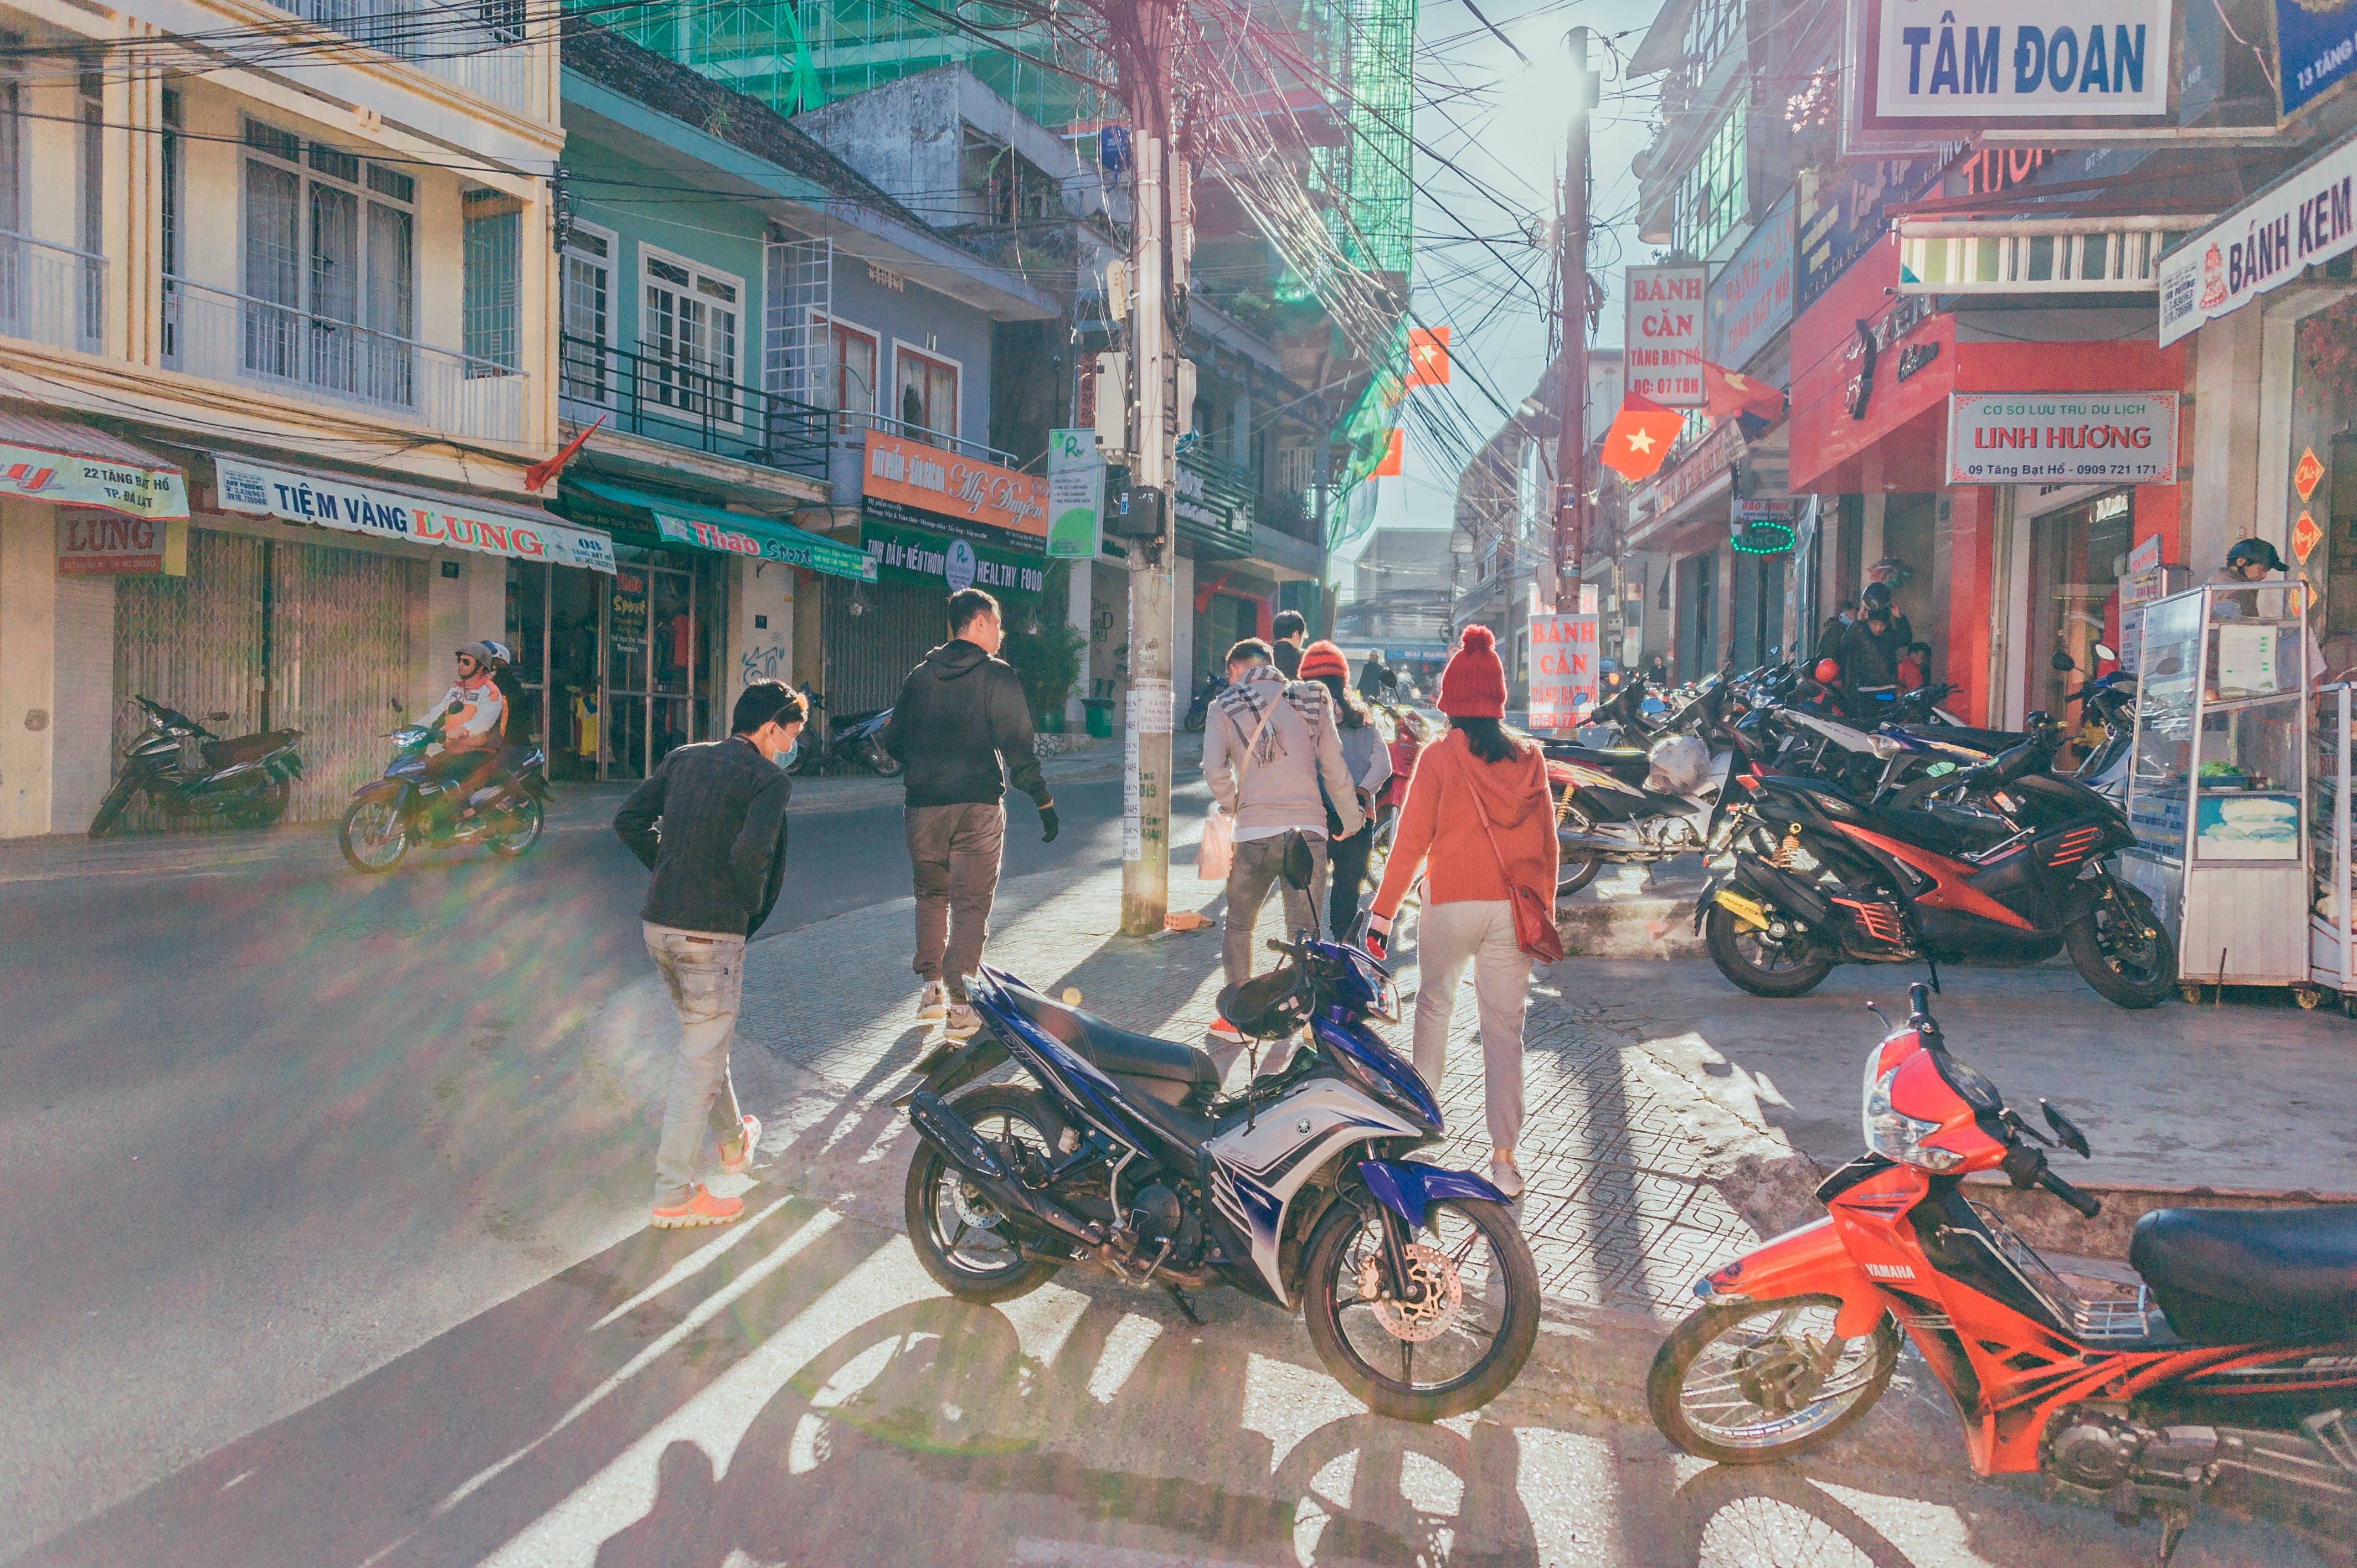 People Walking Near Motorcycles